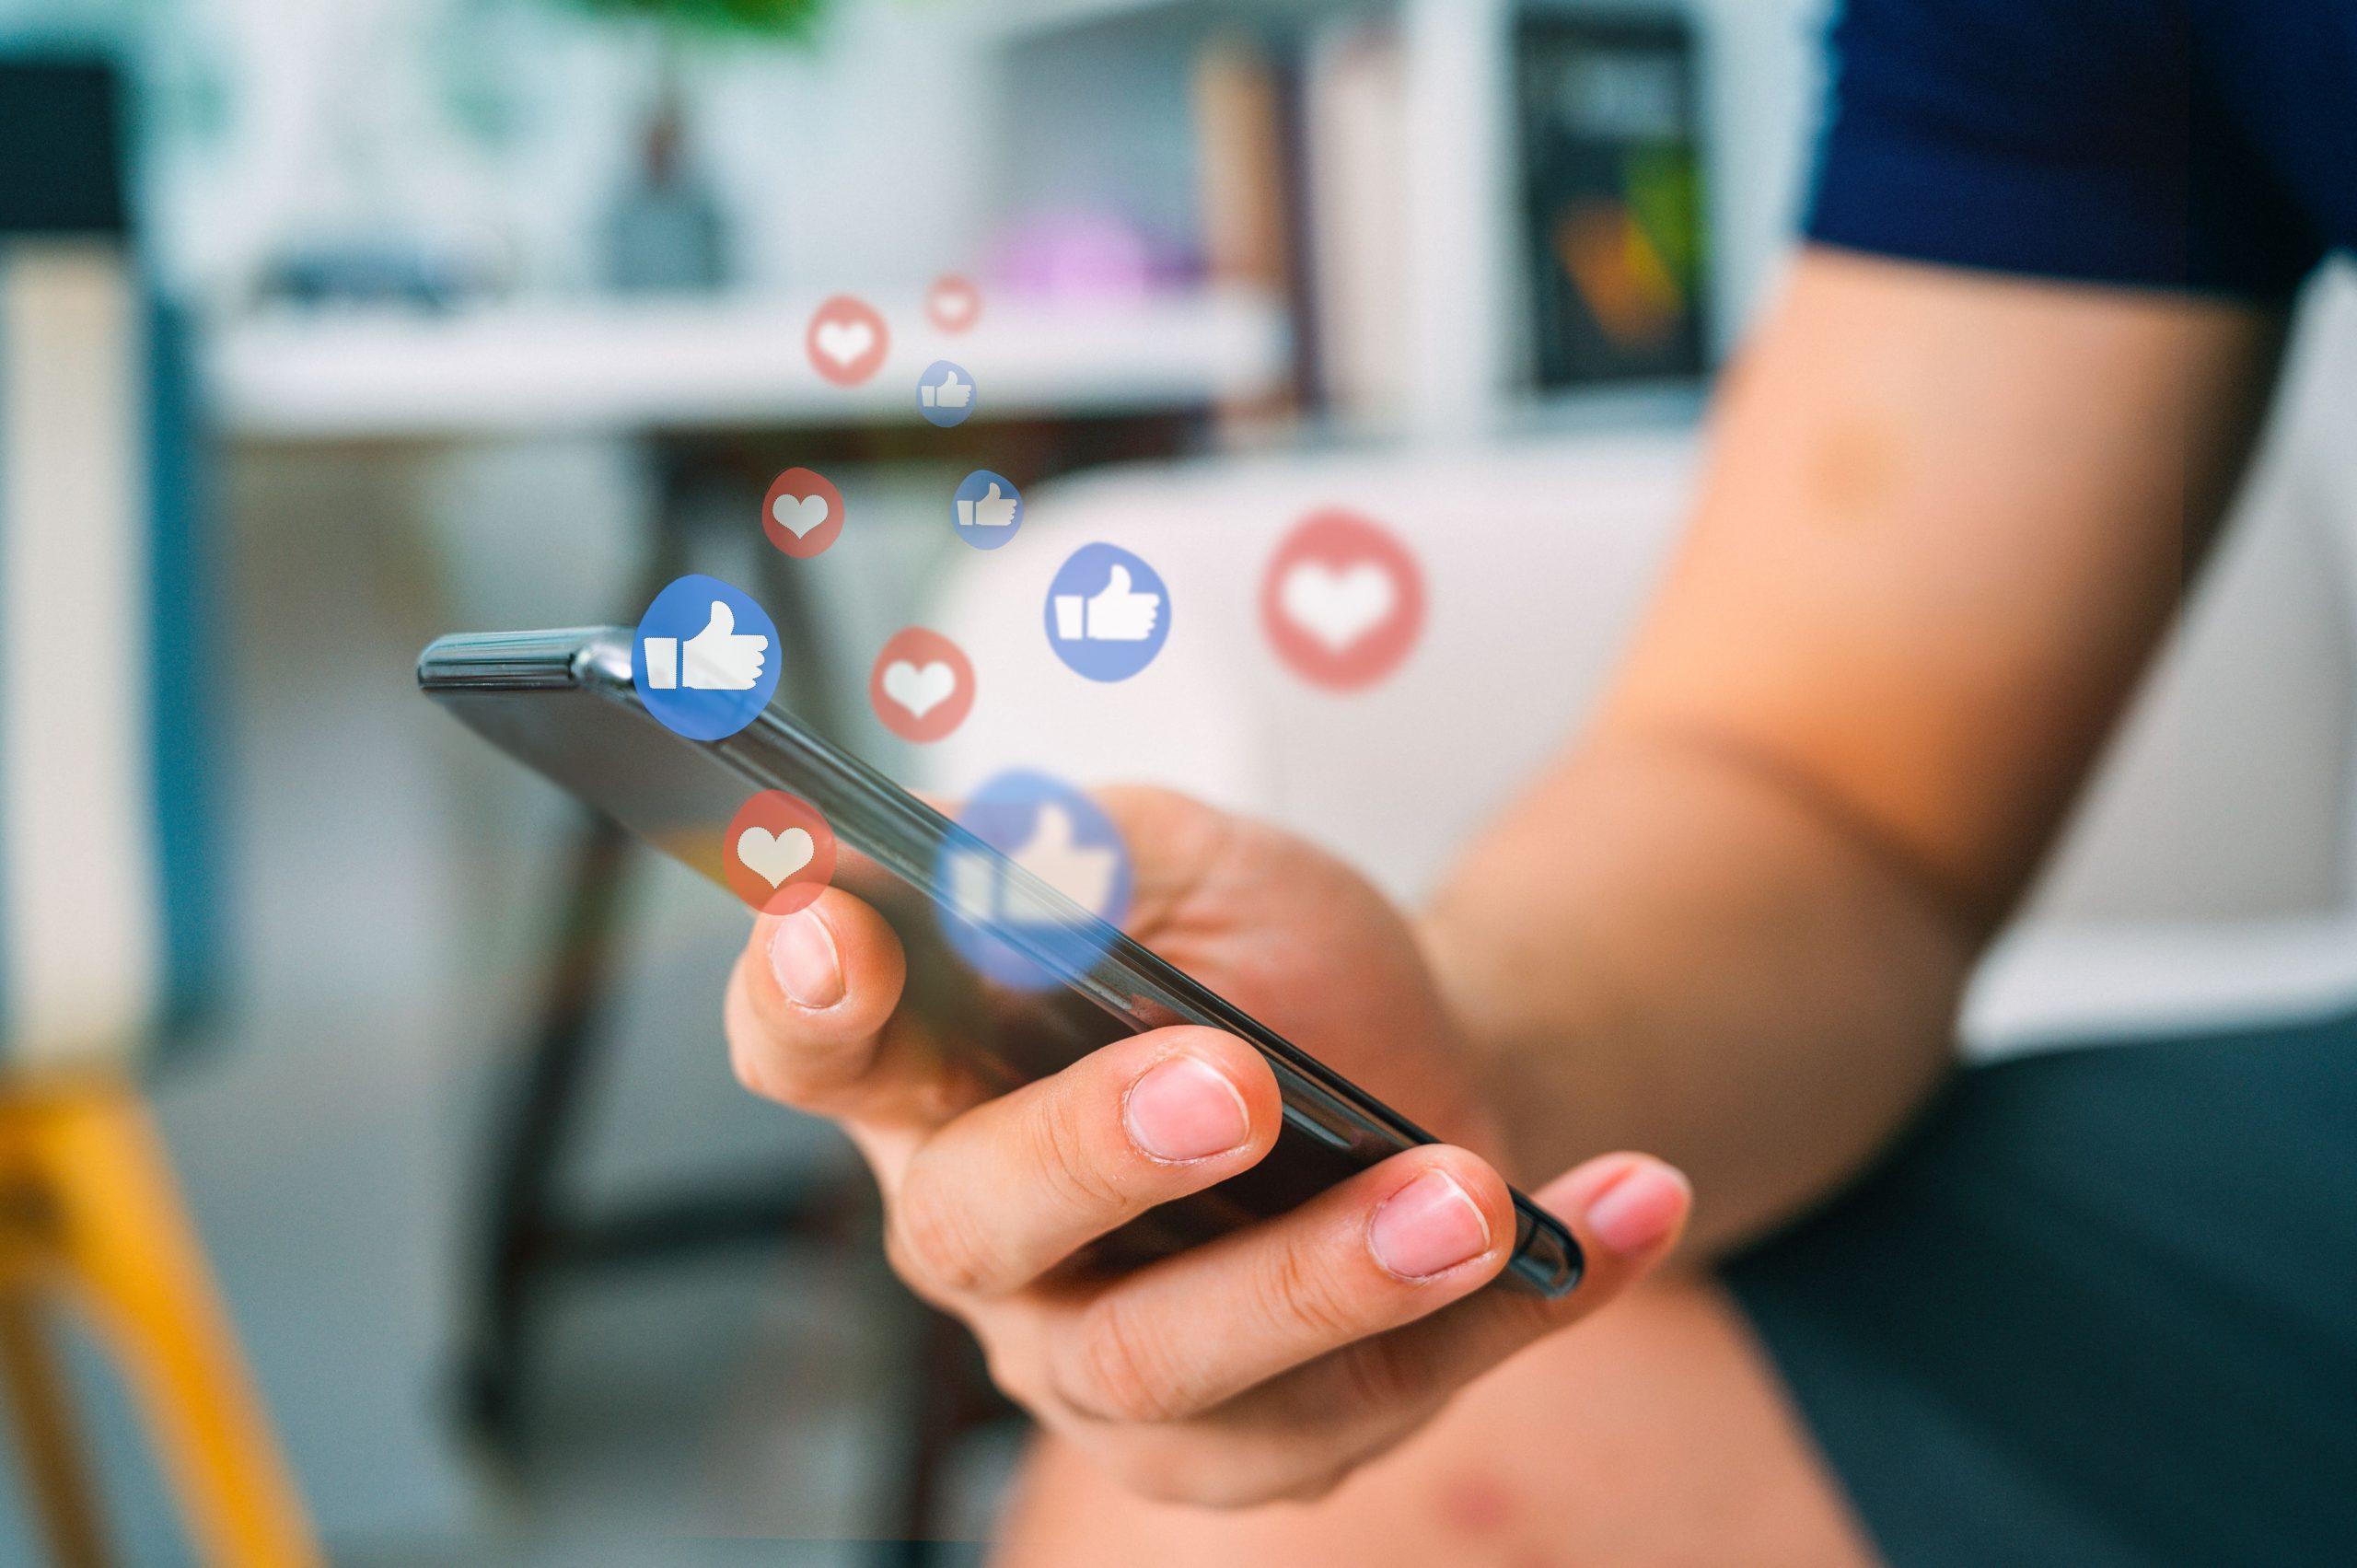 Social Media Recruiting - Smartpohne mit Likes